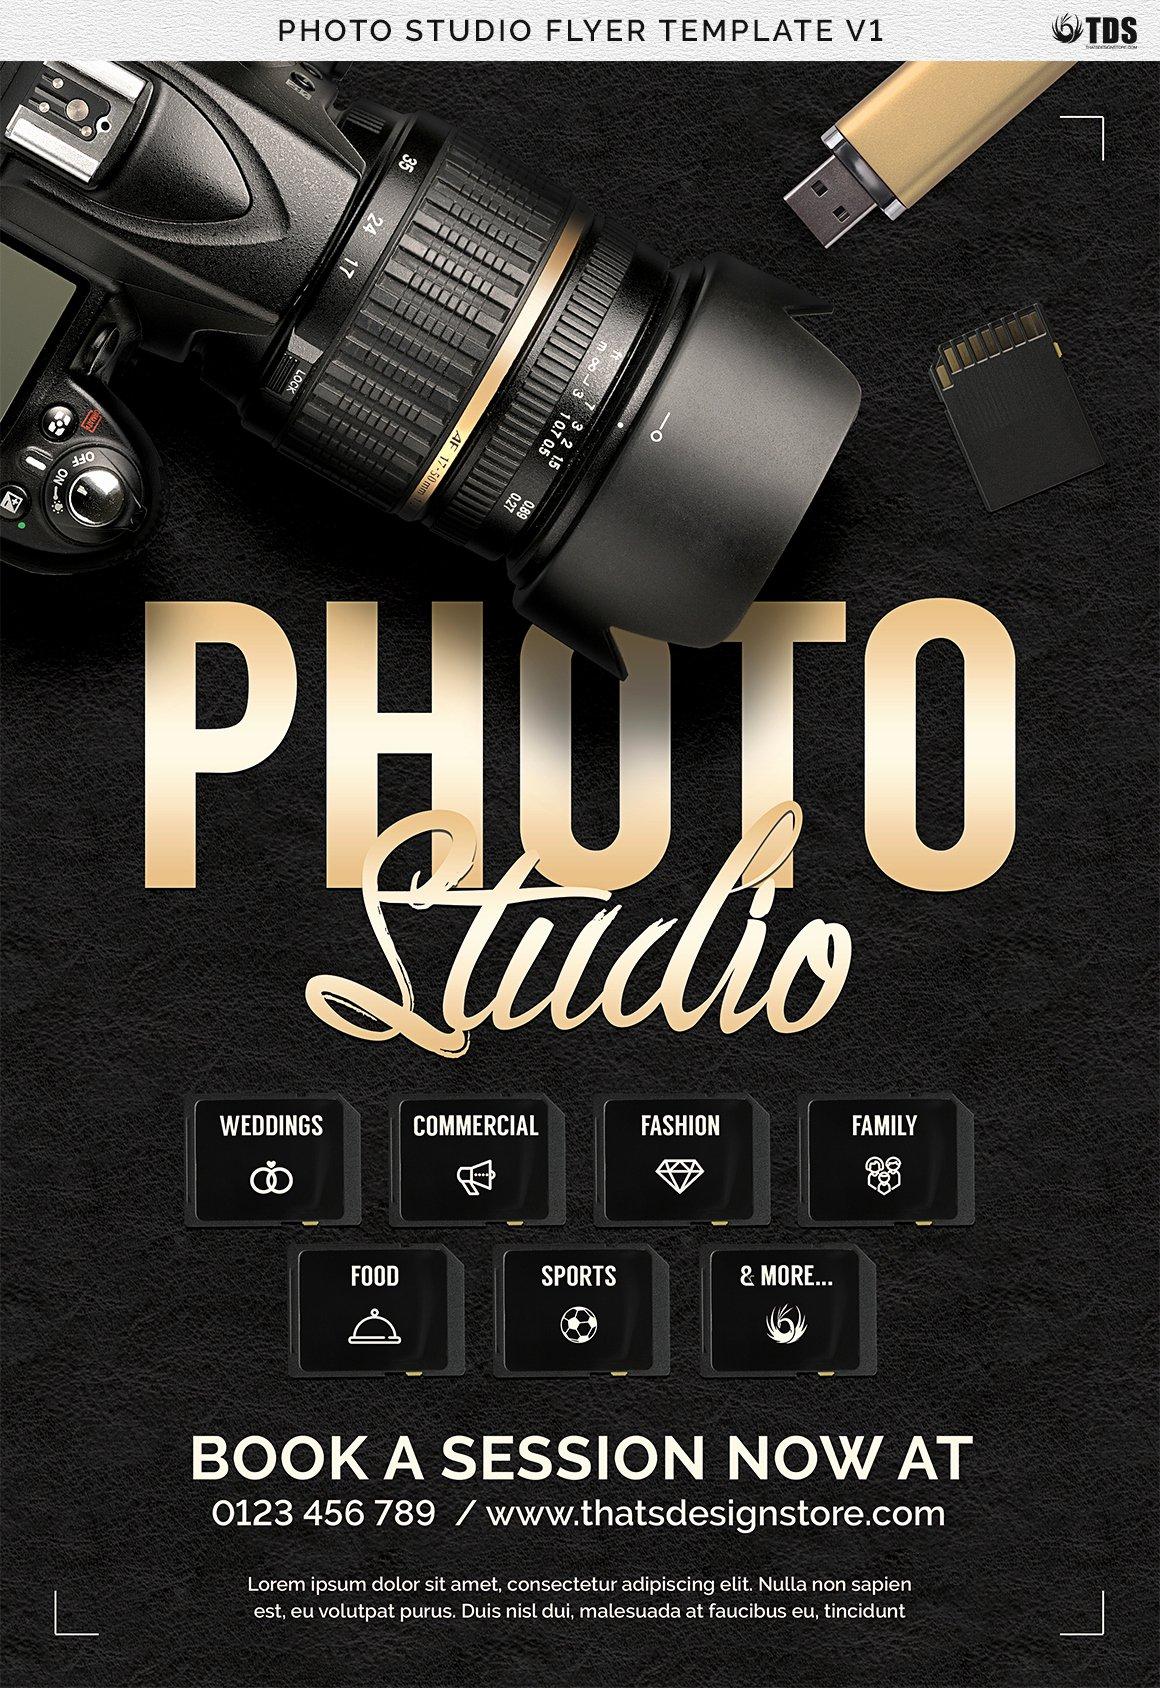 Free Photography Flyer Templates Fresh Studio Flyer Template V1